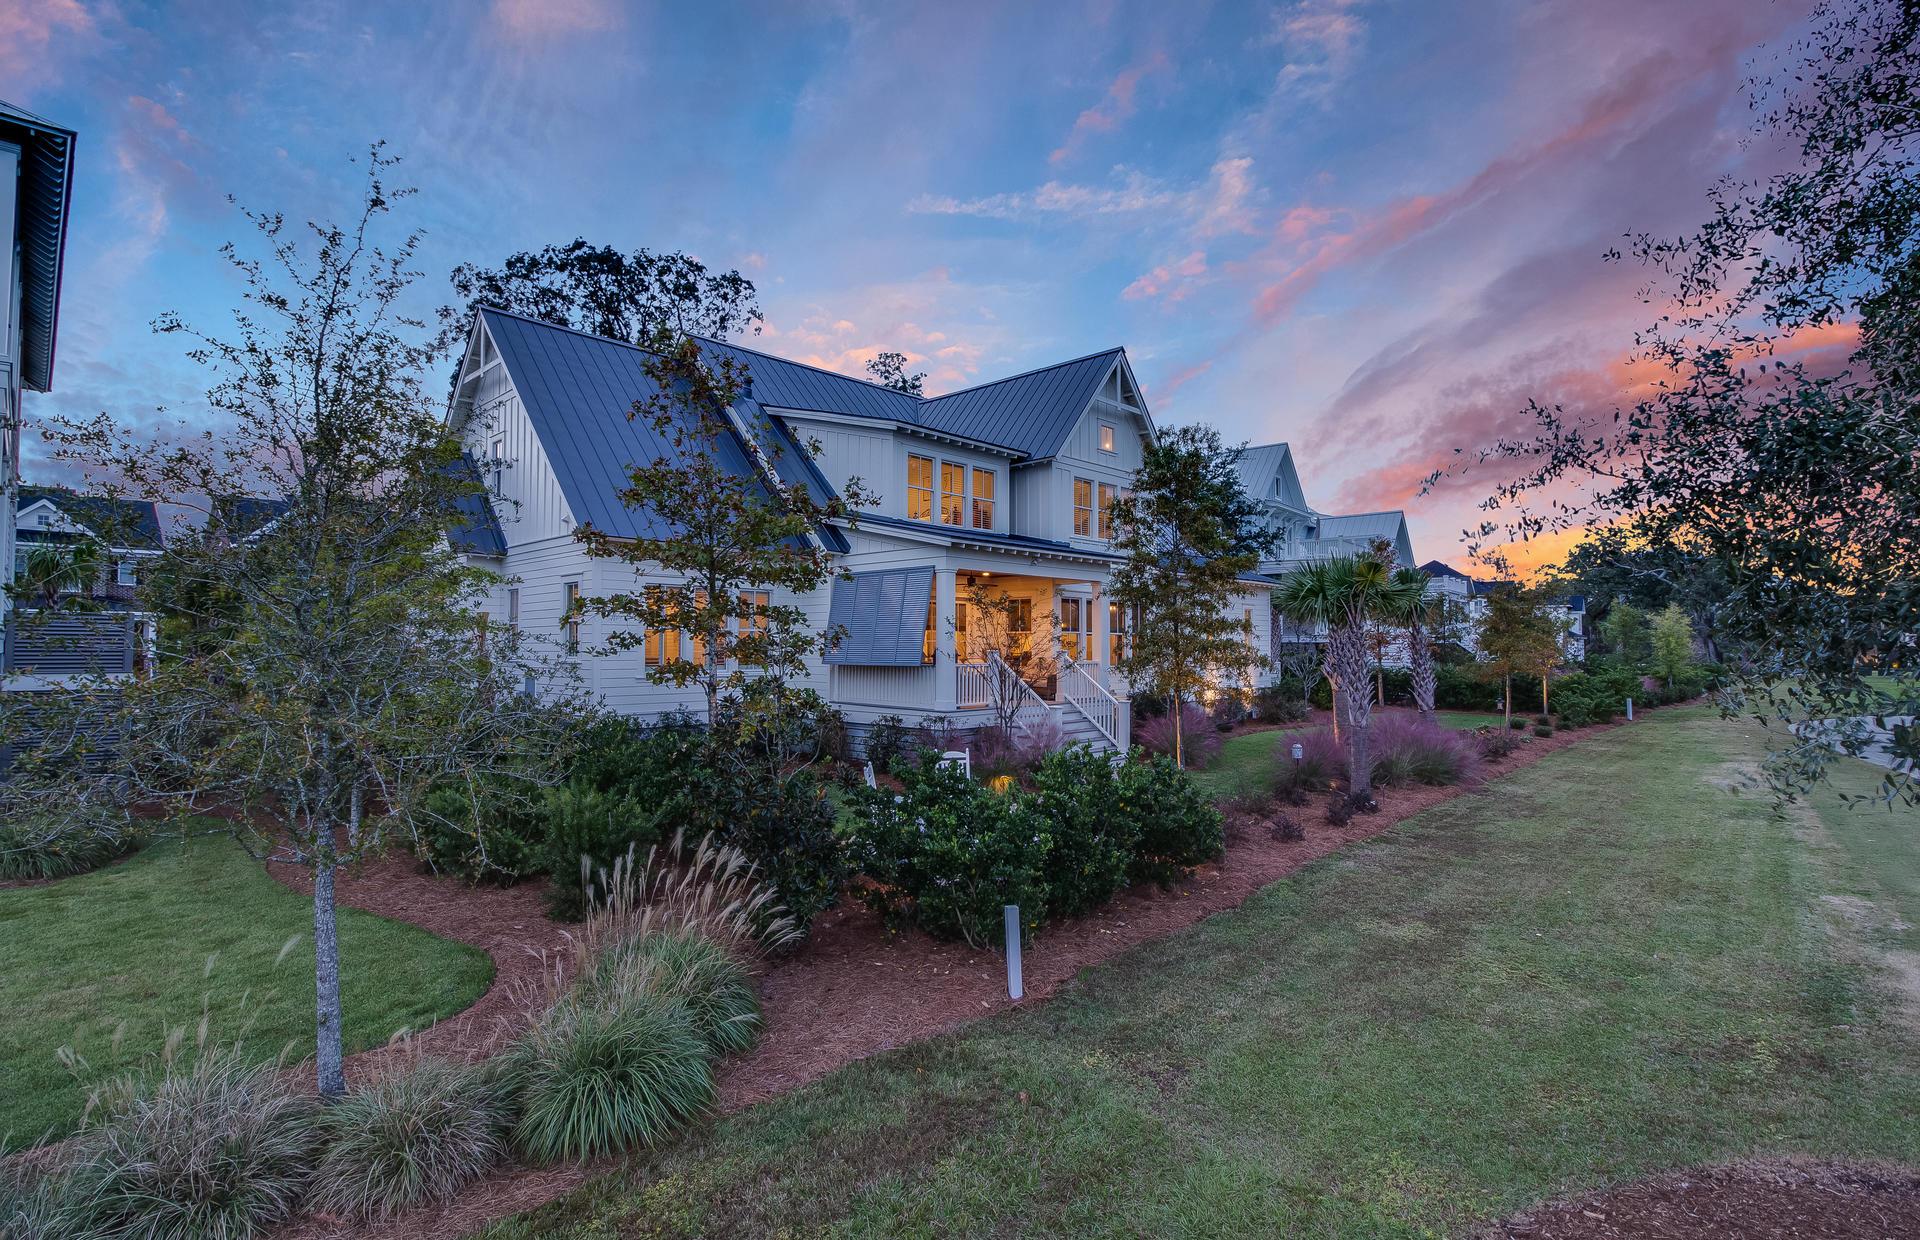 Daniel Island Park Homes For Sale - 117 Brailsford, Charleston, SC - 92